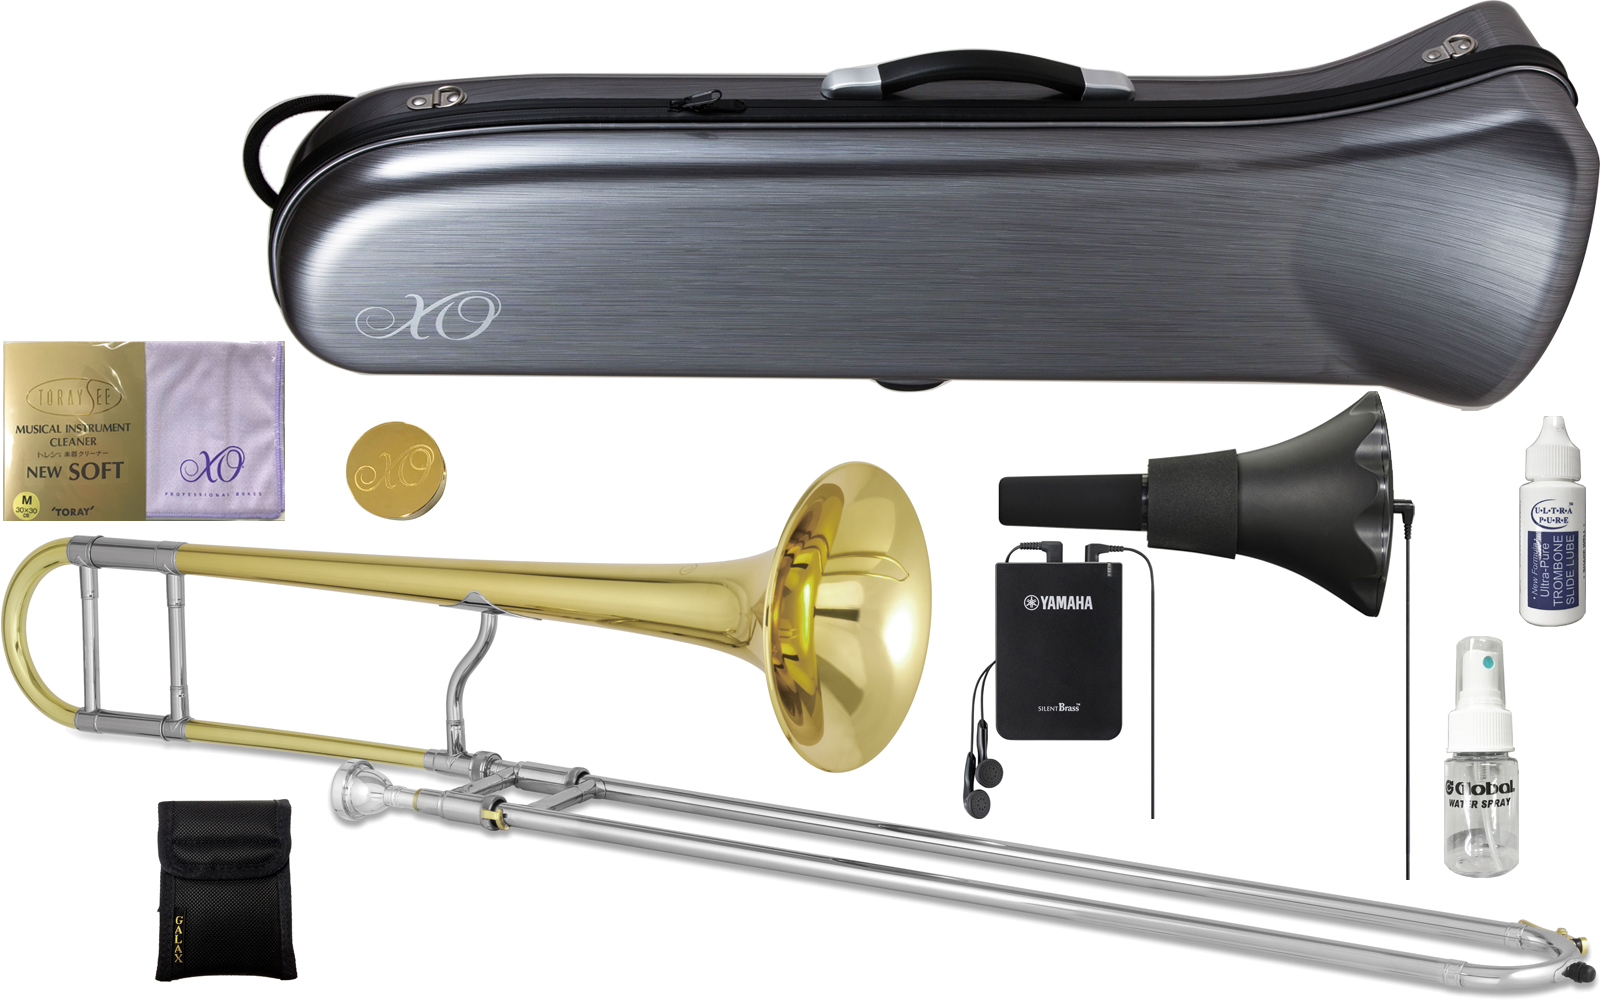 XO ( エックスオー ) 1632GL-LT トロンボーン 新品 B♭ テナートロンボーン イエローブラス ジョンフェチョックモデル 細管 B♭ トロンボーン 管楽器 Tenor Trombones セットB 送料無料